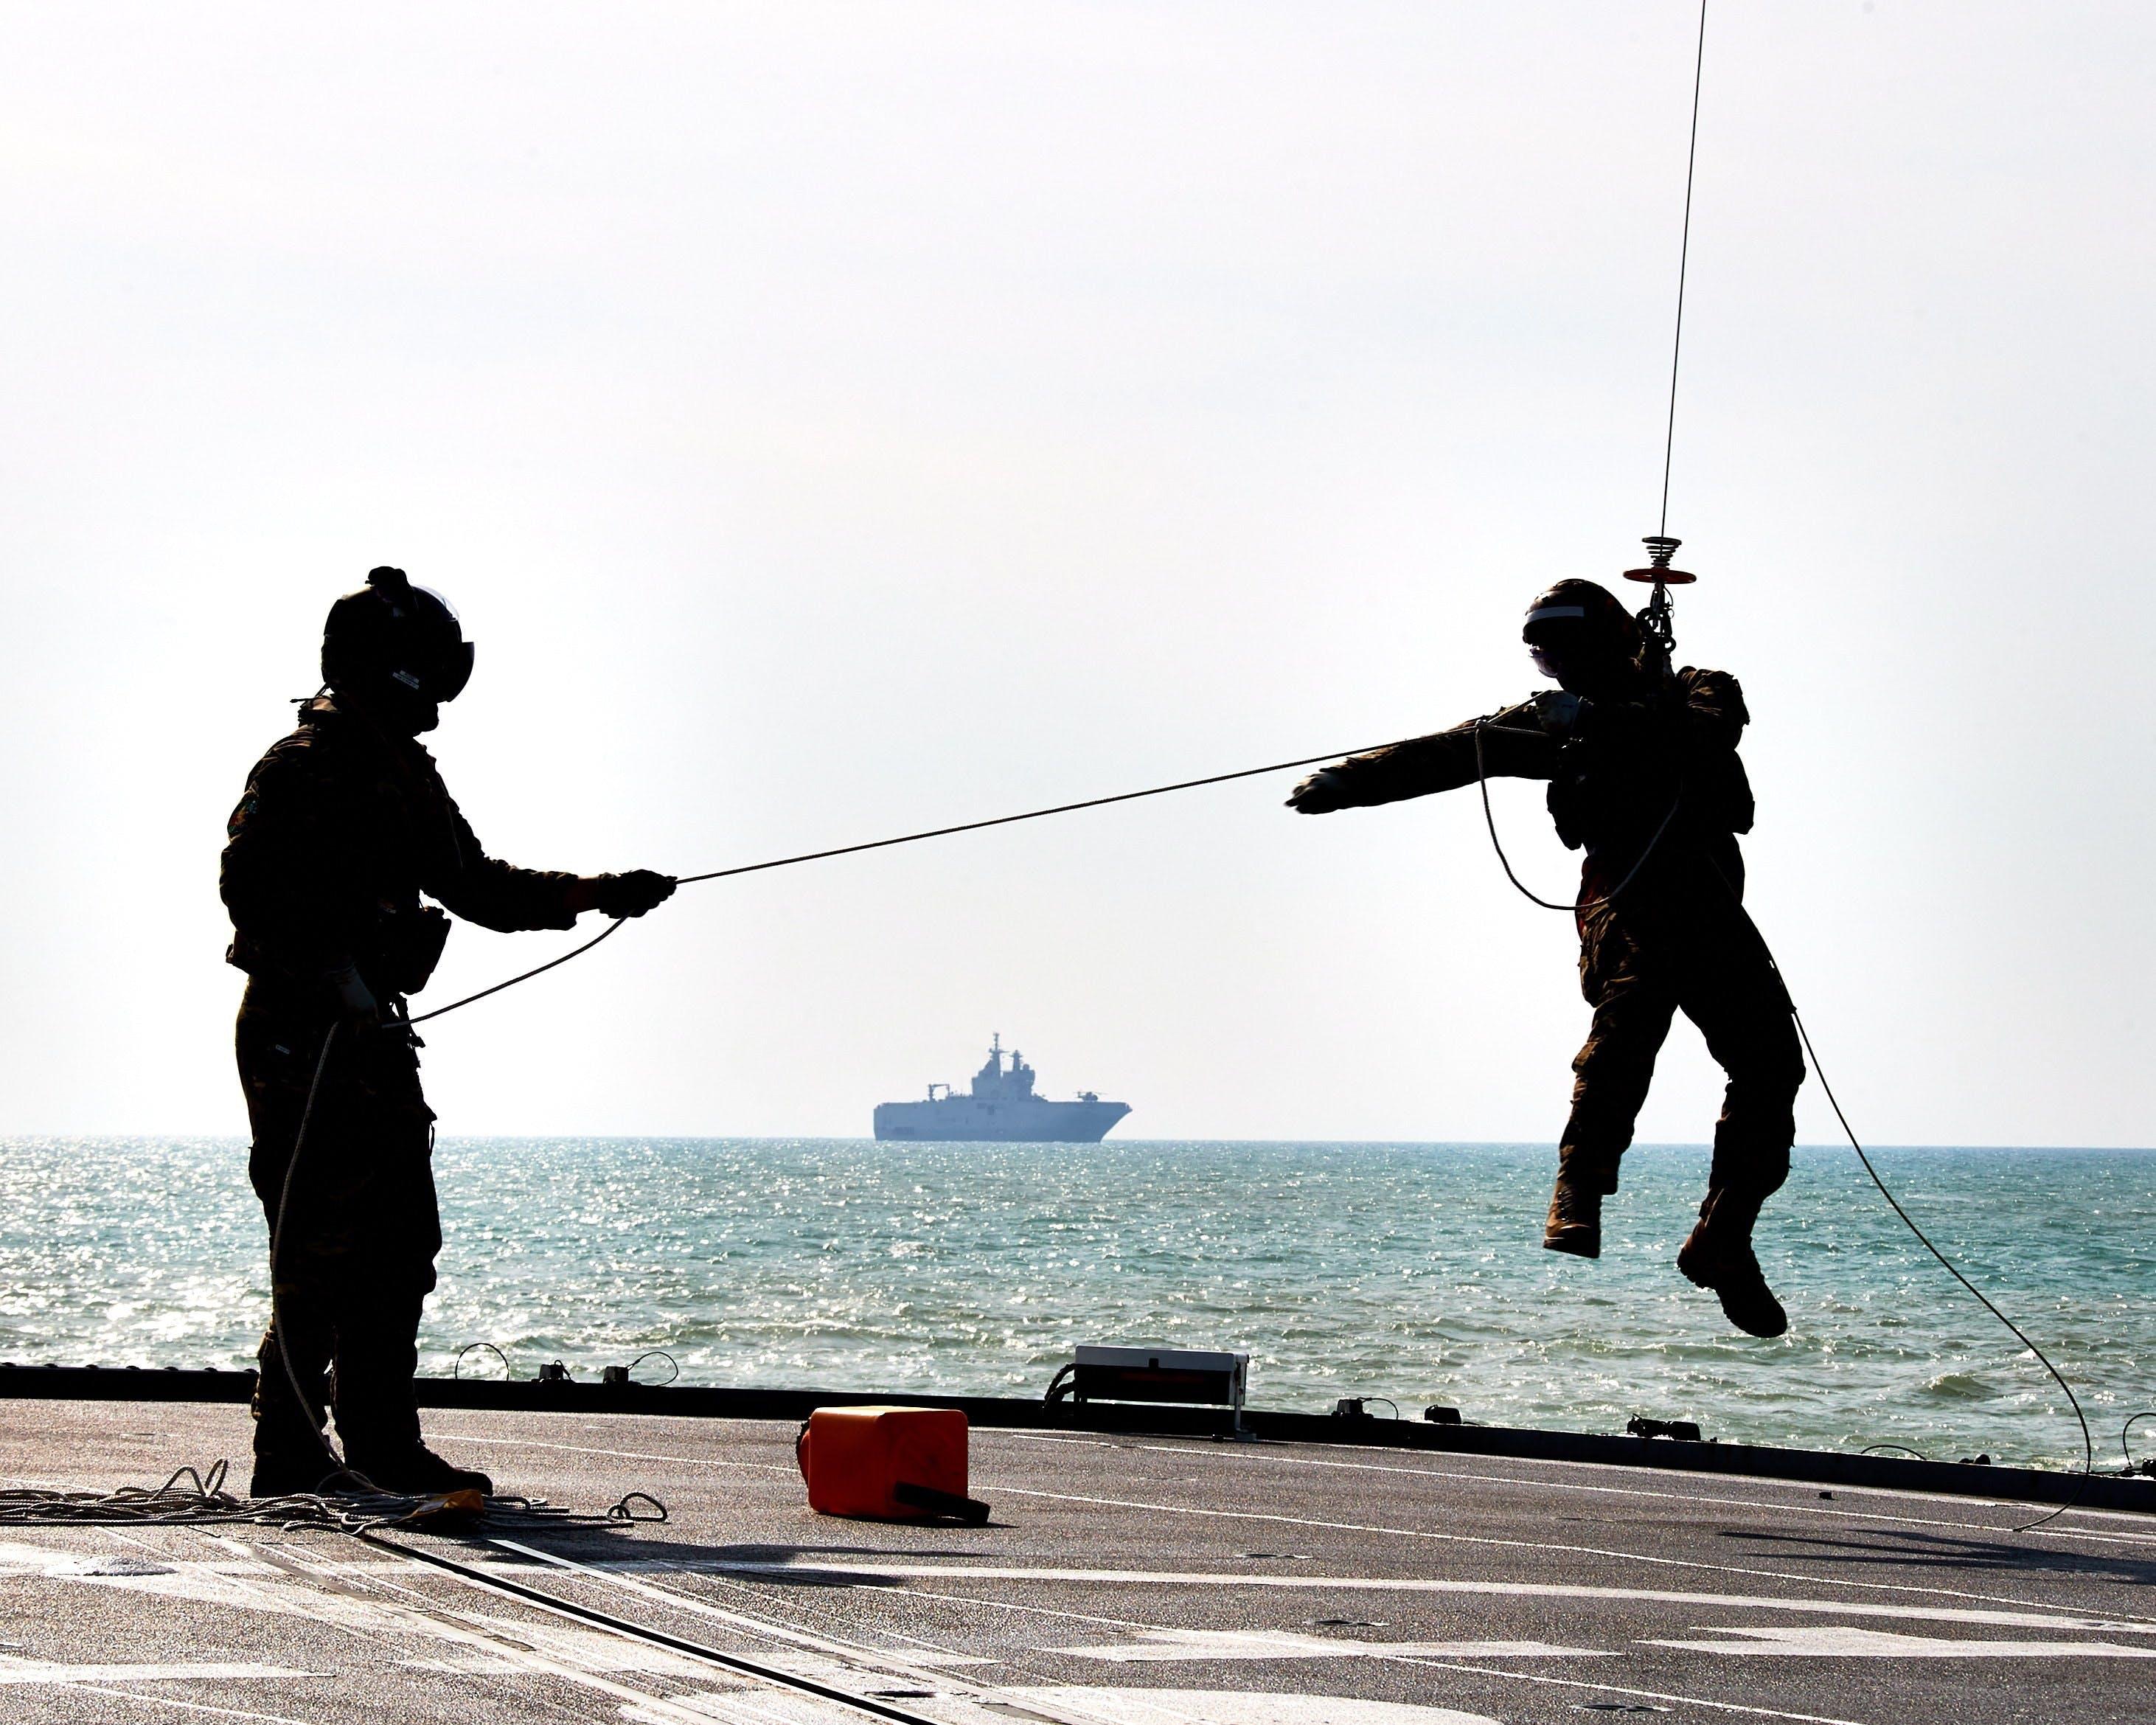 Royal Navy and Royal Marines train alongside partner naval forces